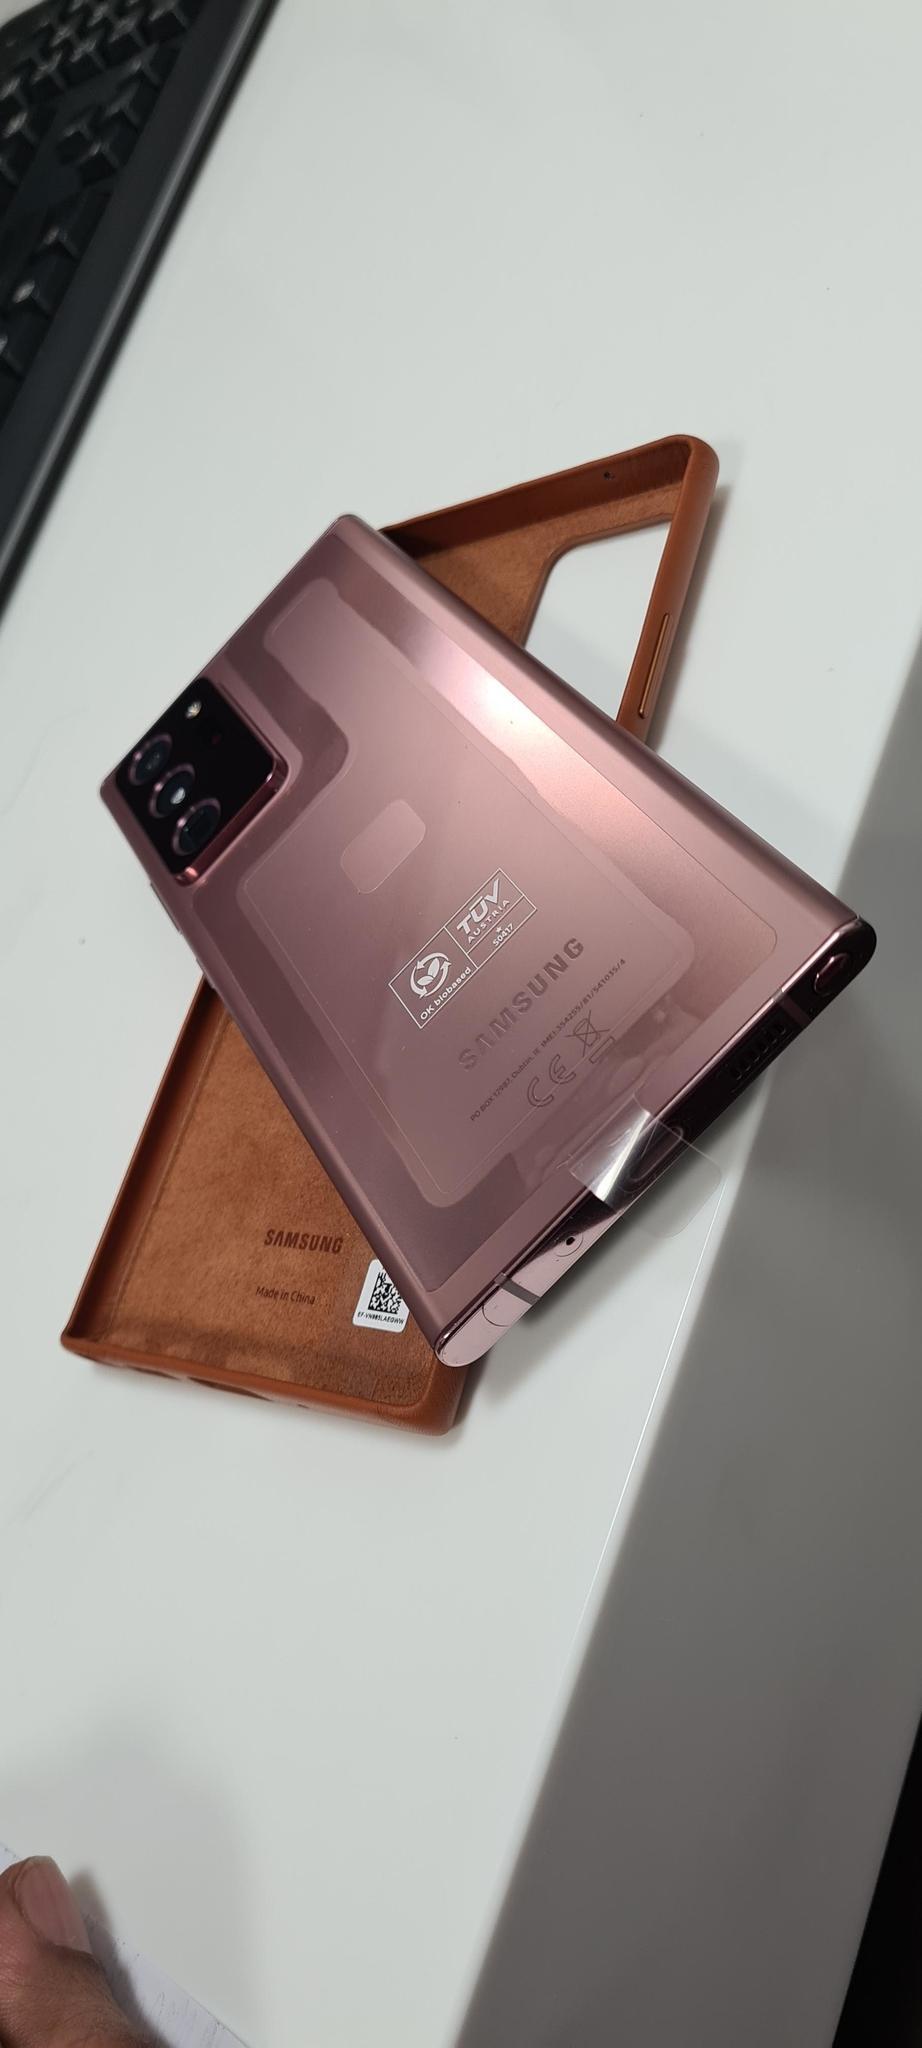 Samsung Galaxy Note 20 Ultra (256 GB) - 2 years Wa